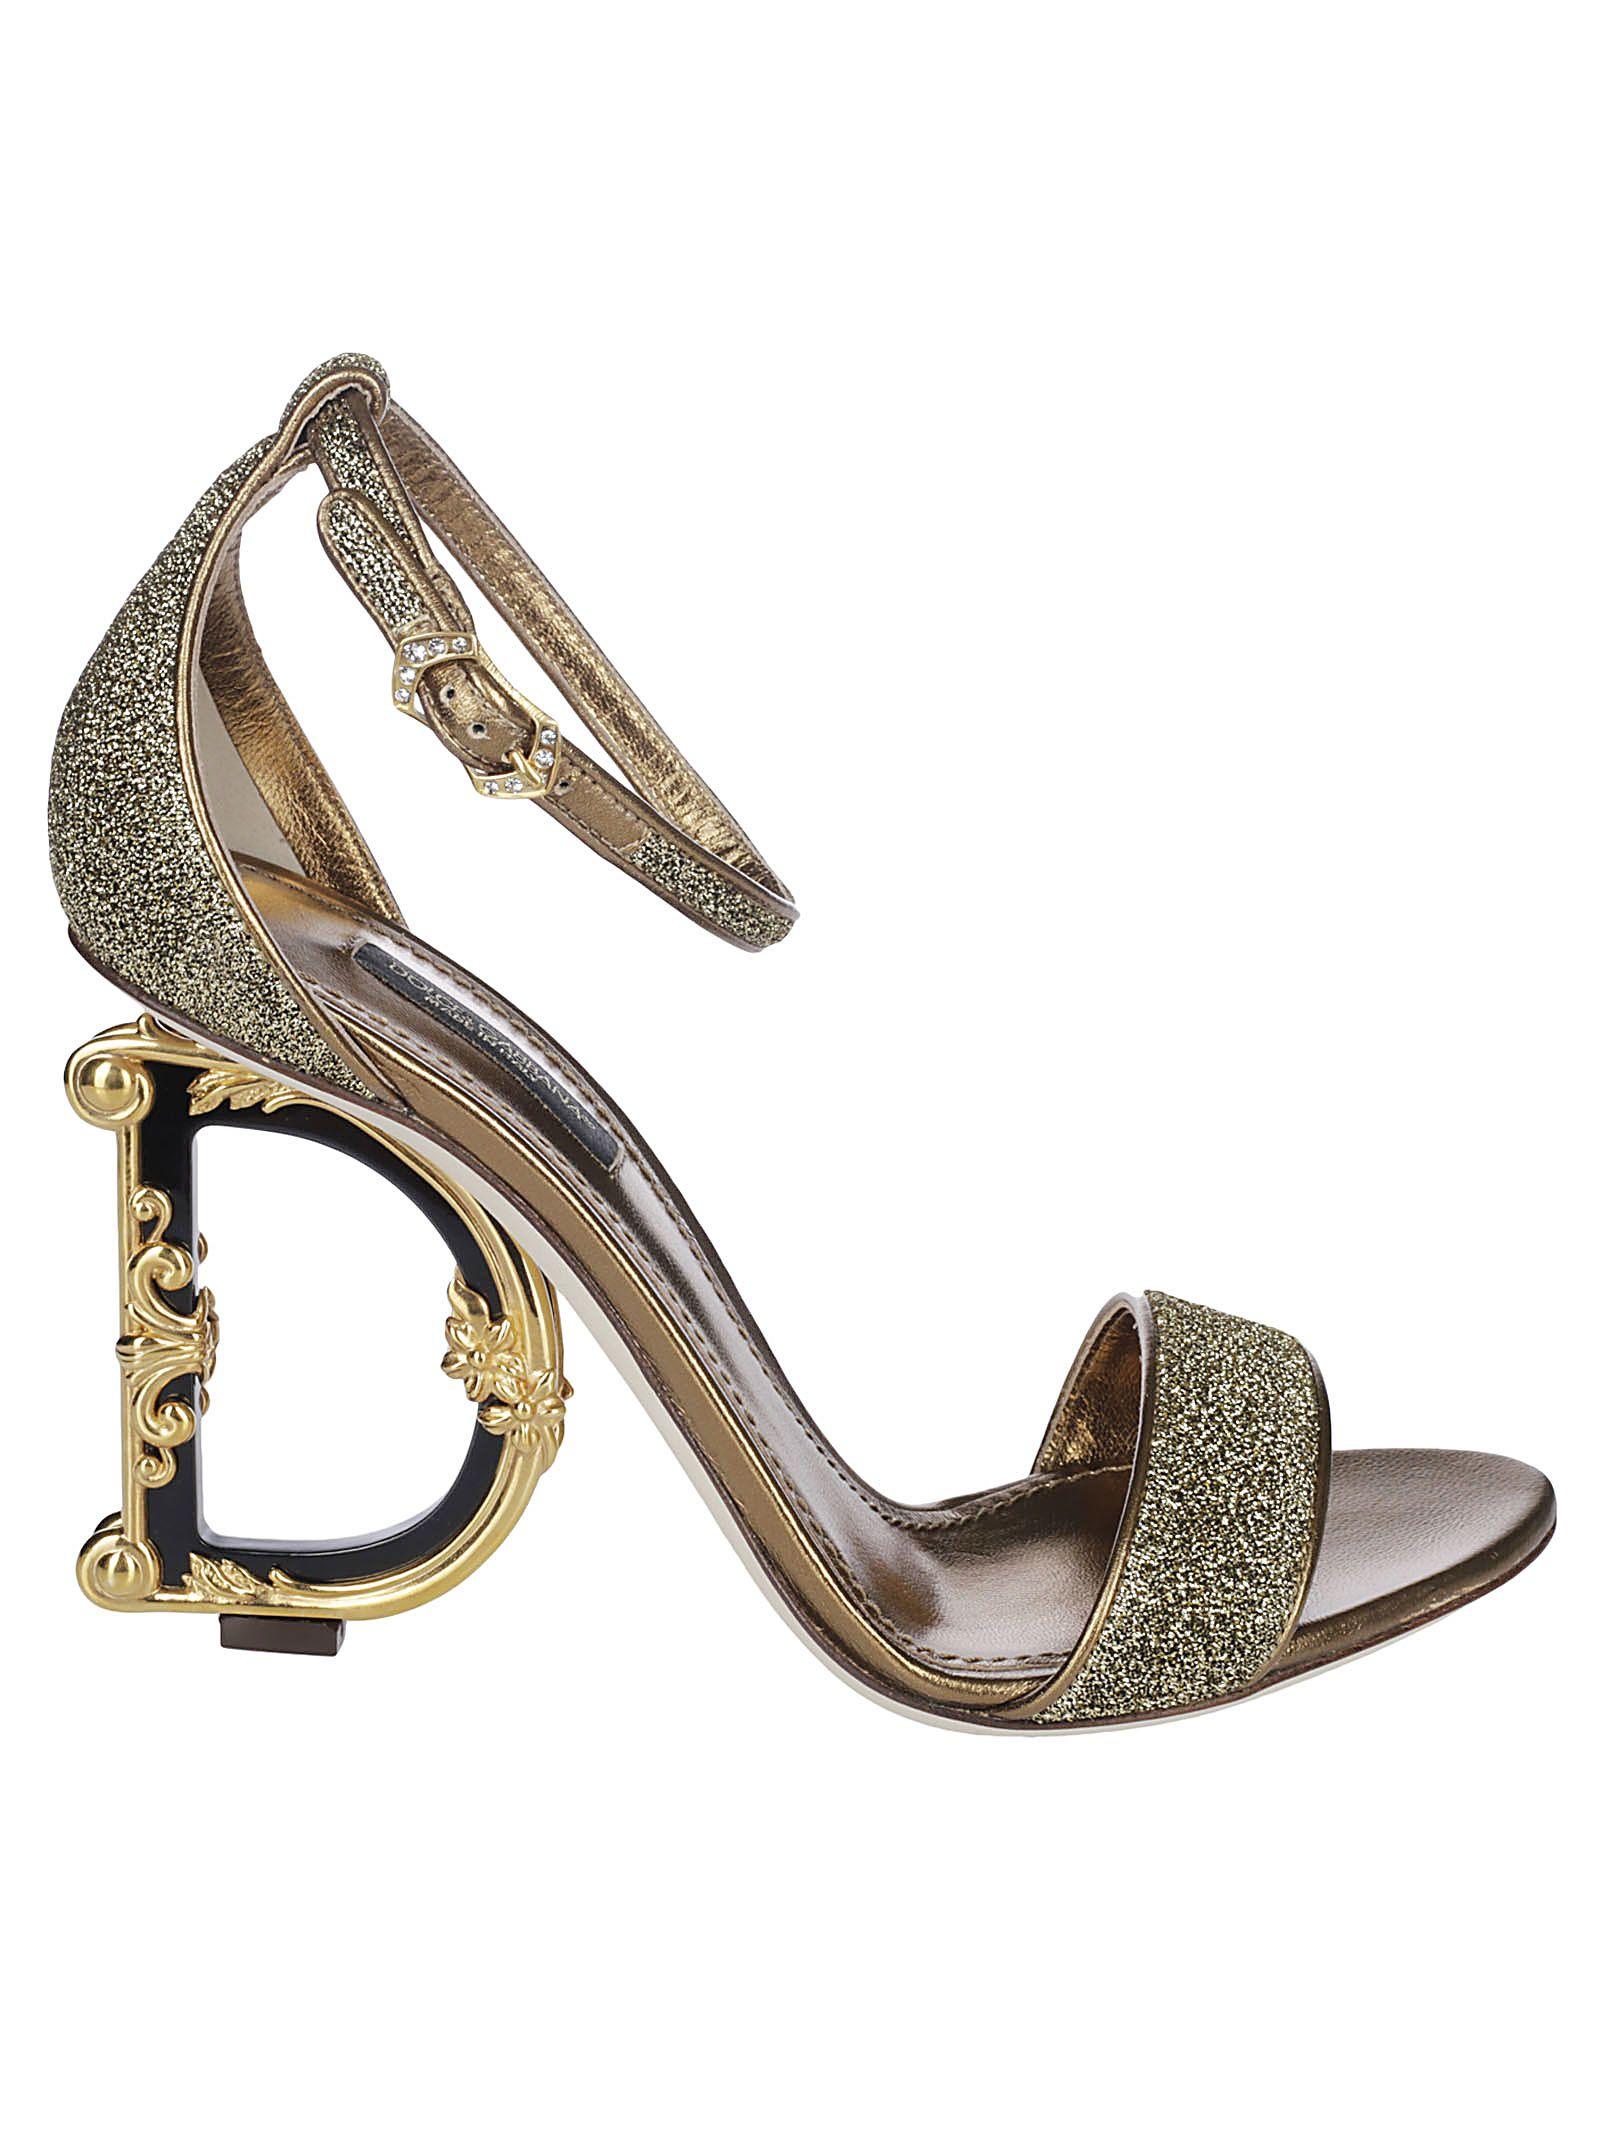 Dolce & Gabbana Glittered Sandals